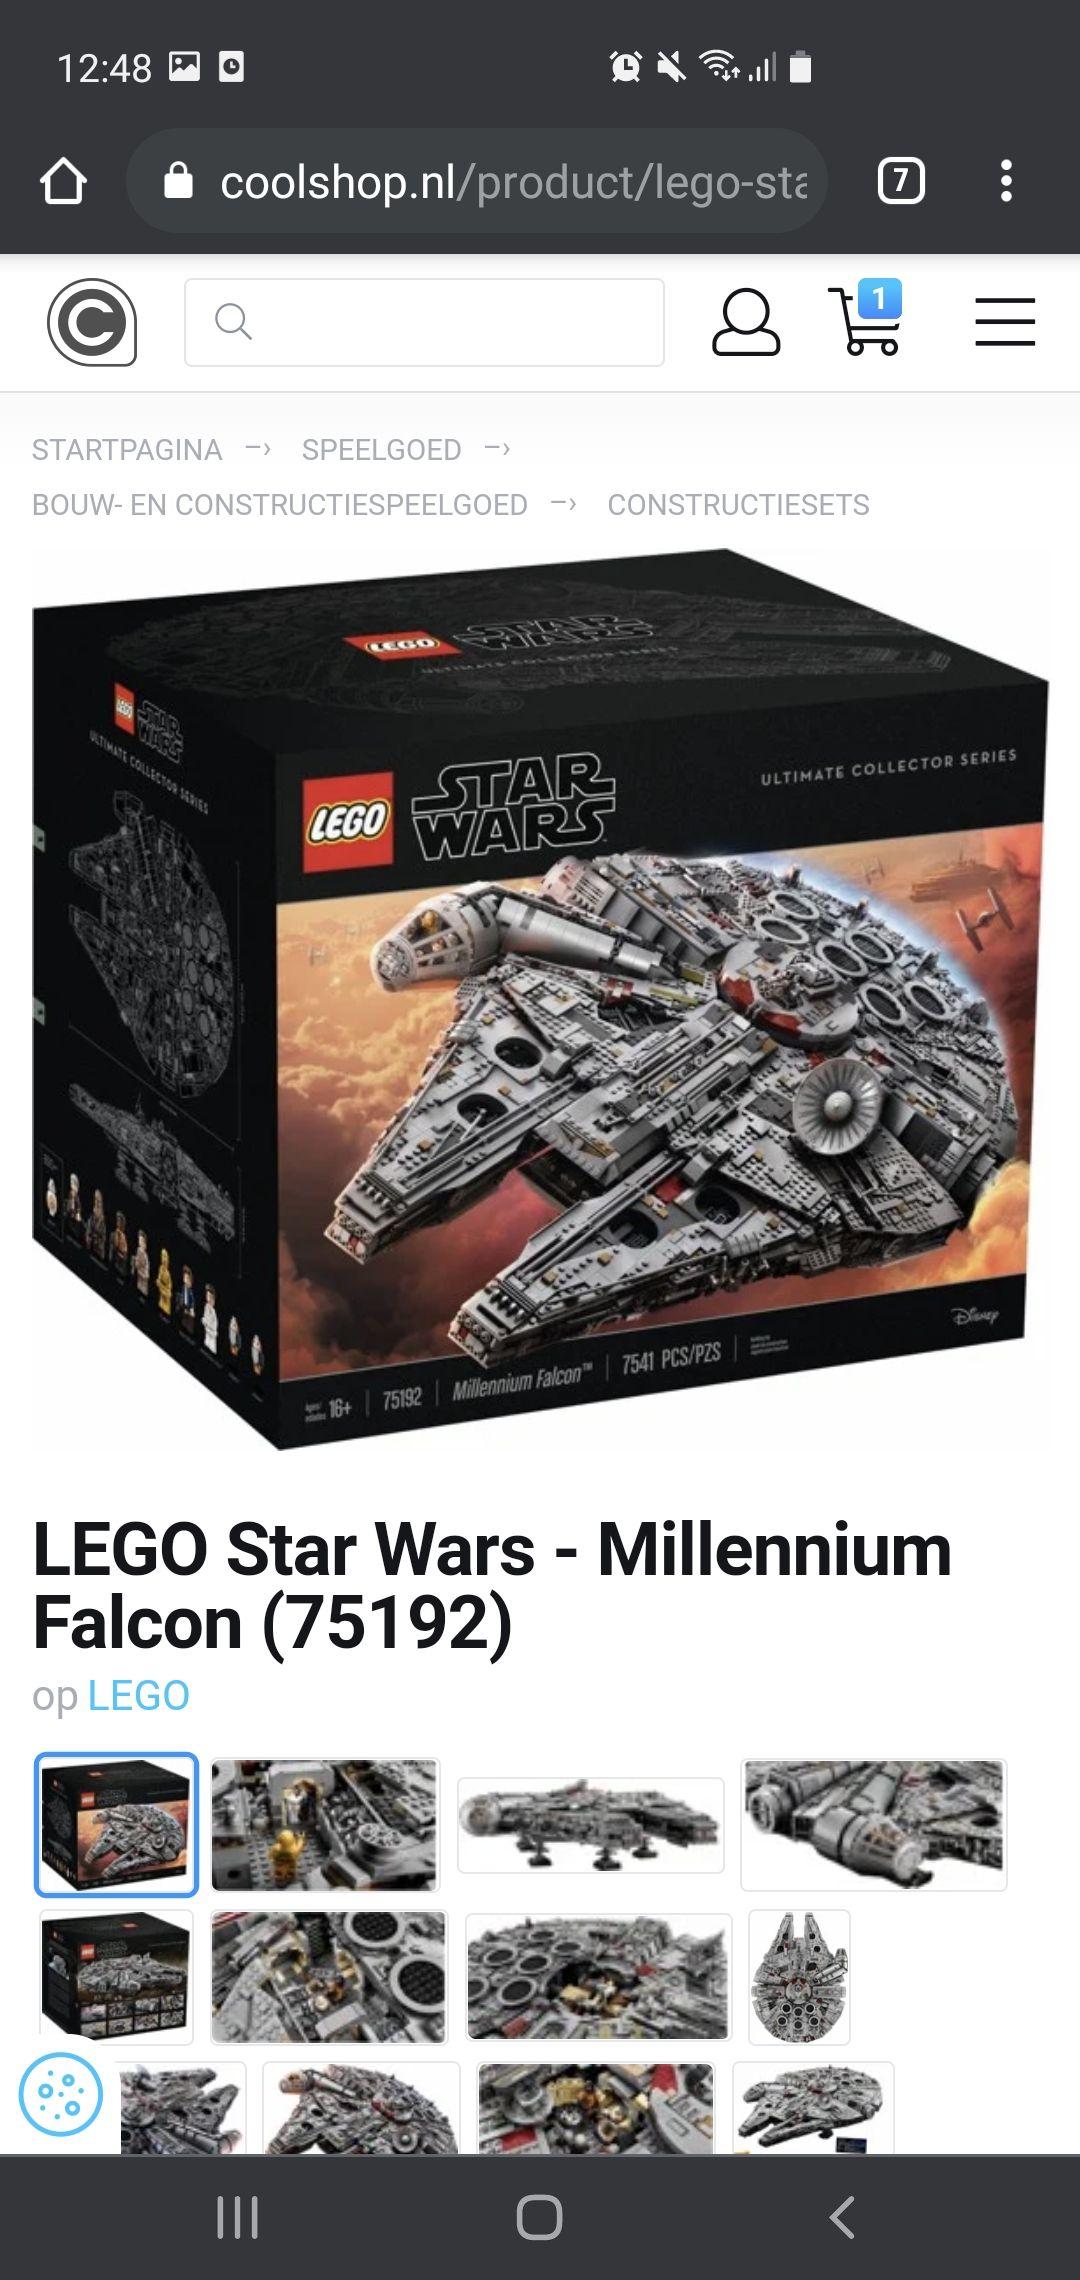 LEGO: Millenium falcon 75192 (€710 inclusief. Verzending)